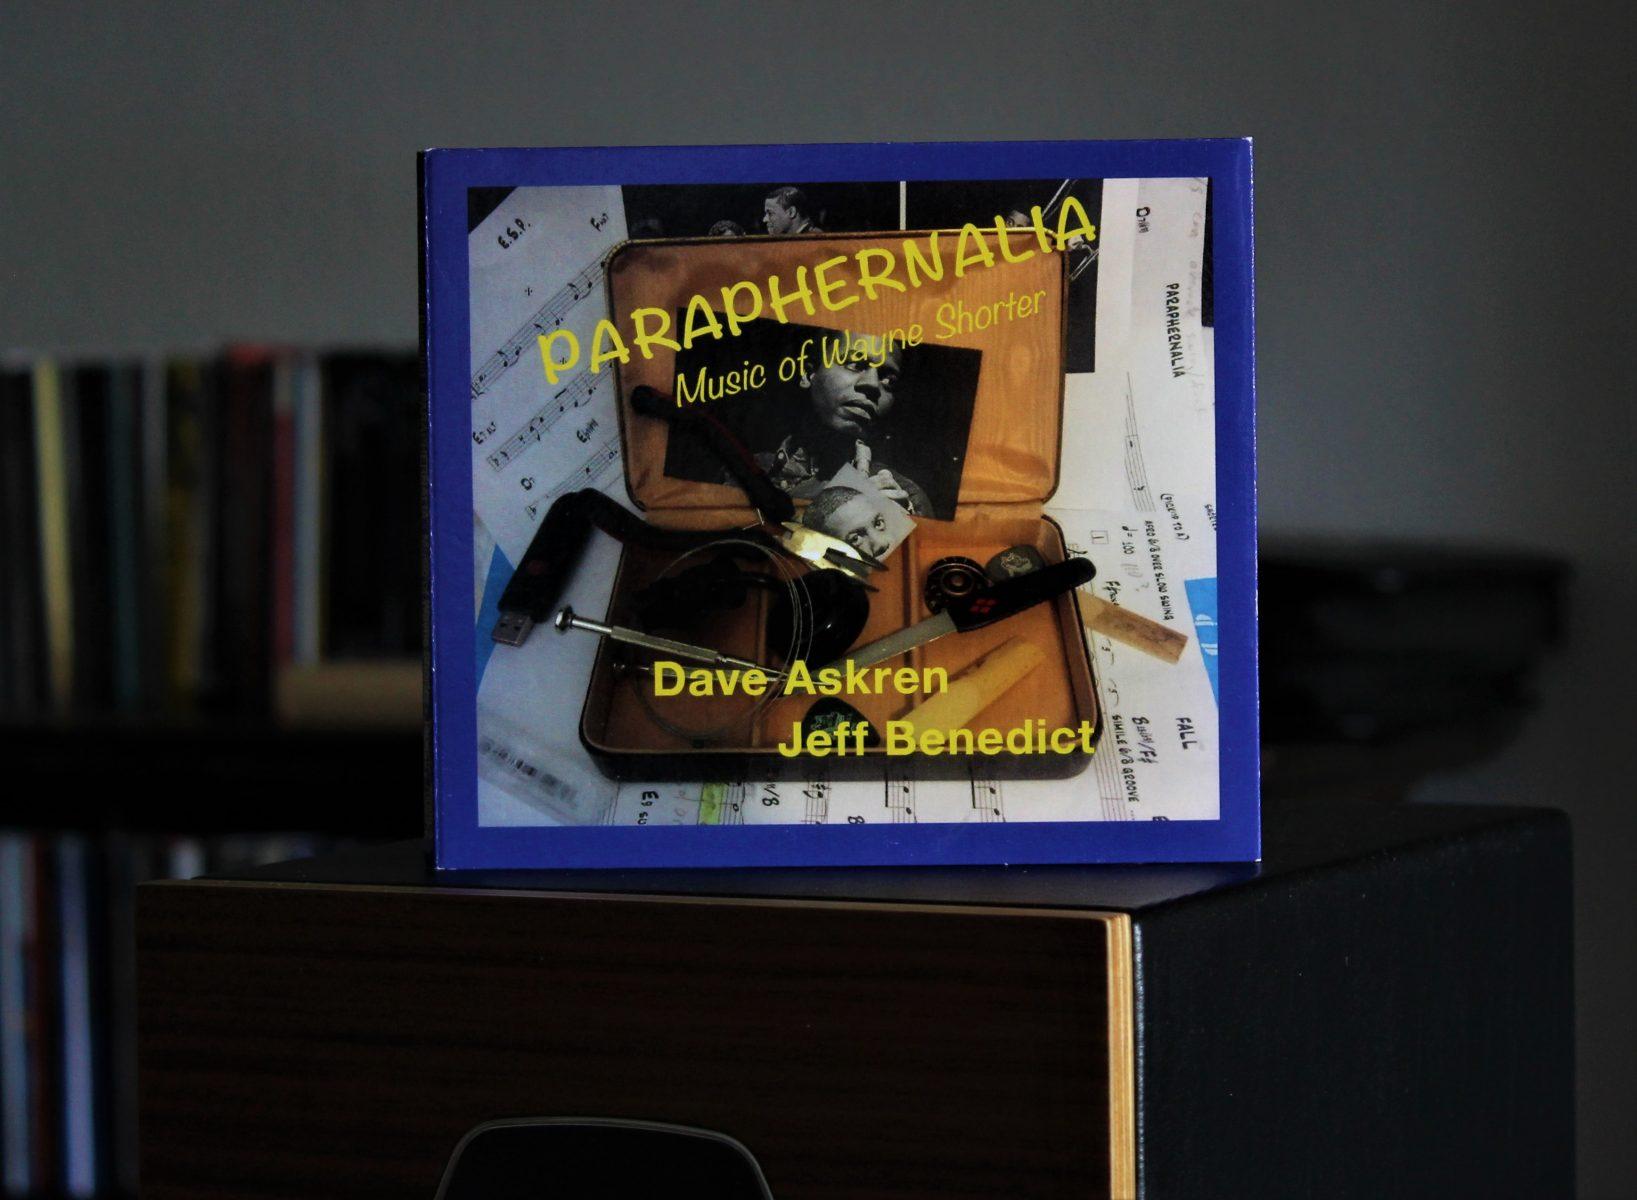 Dave Askren and Jeff Benedict, Paraphernalia | The Vinyl Anachronist